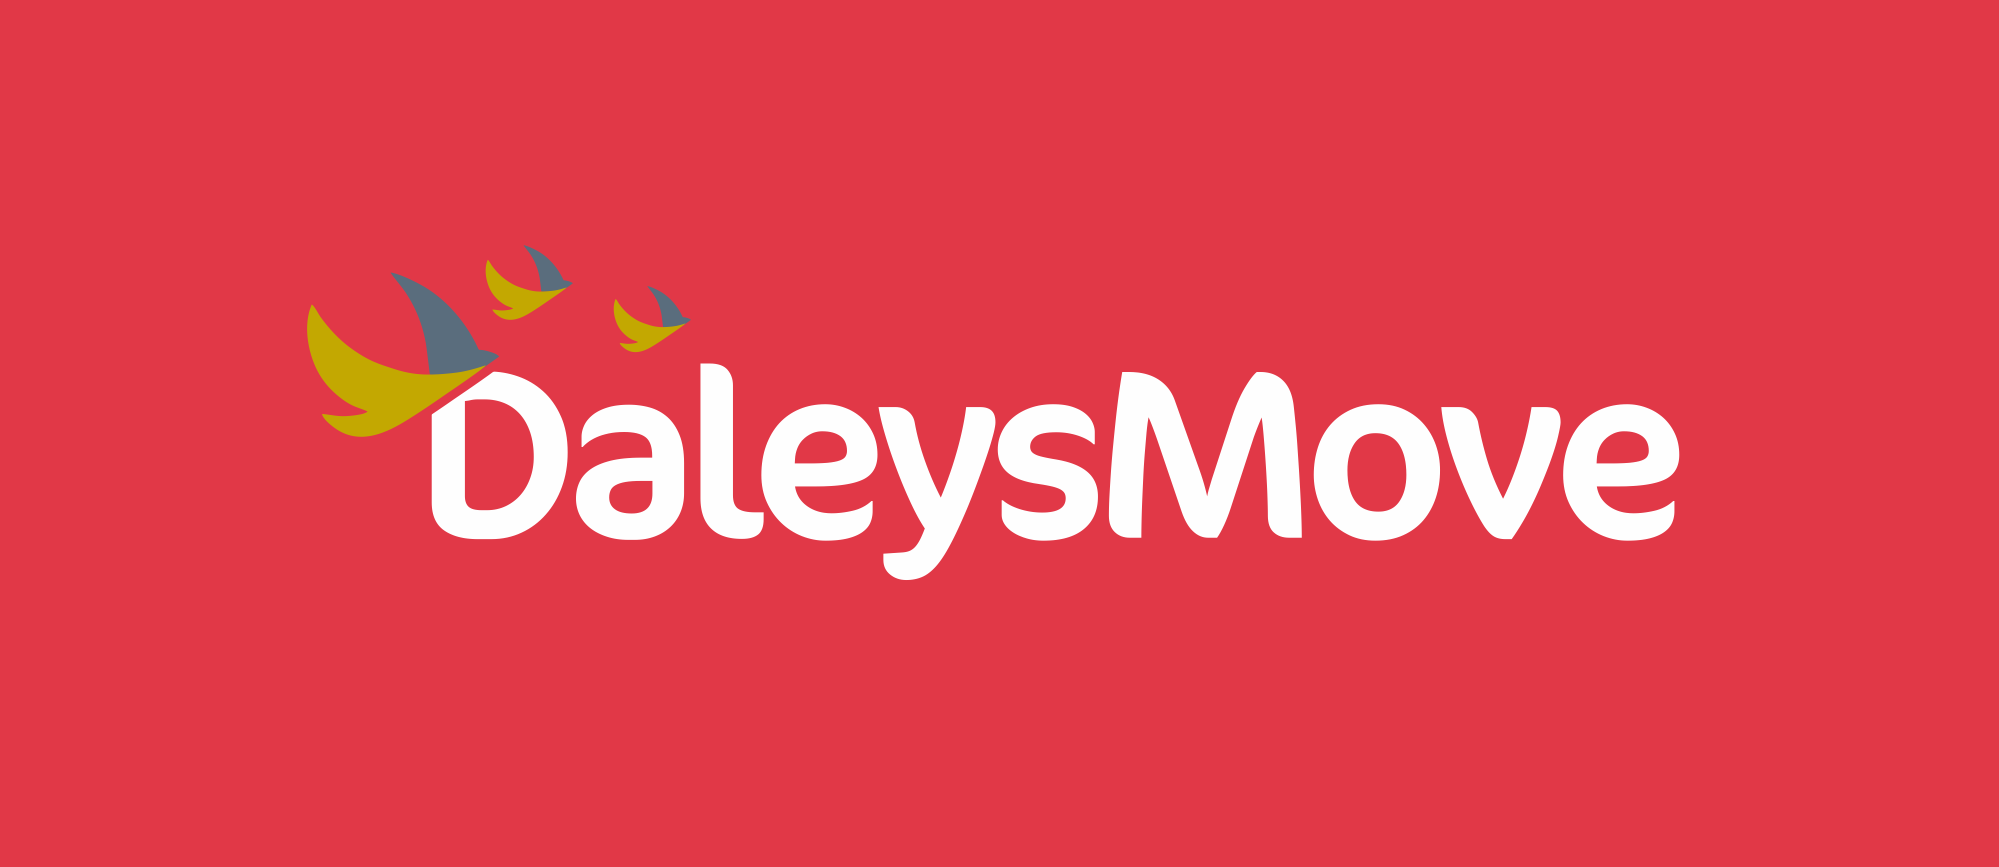 Read Daleysmove Reviews